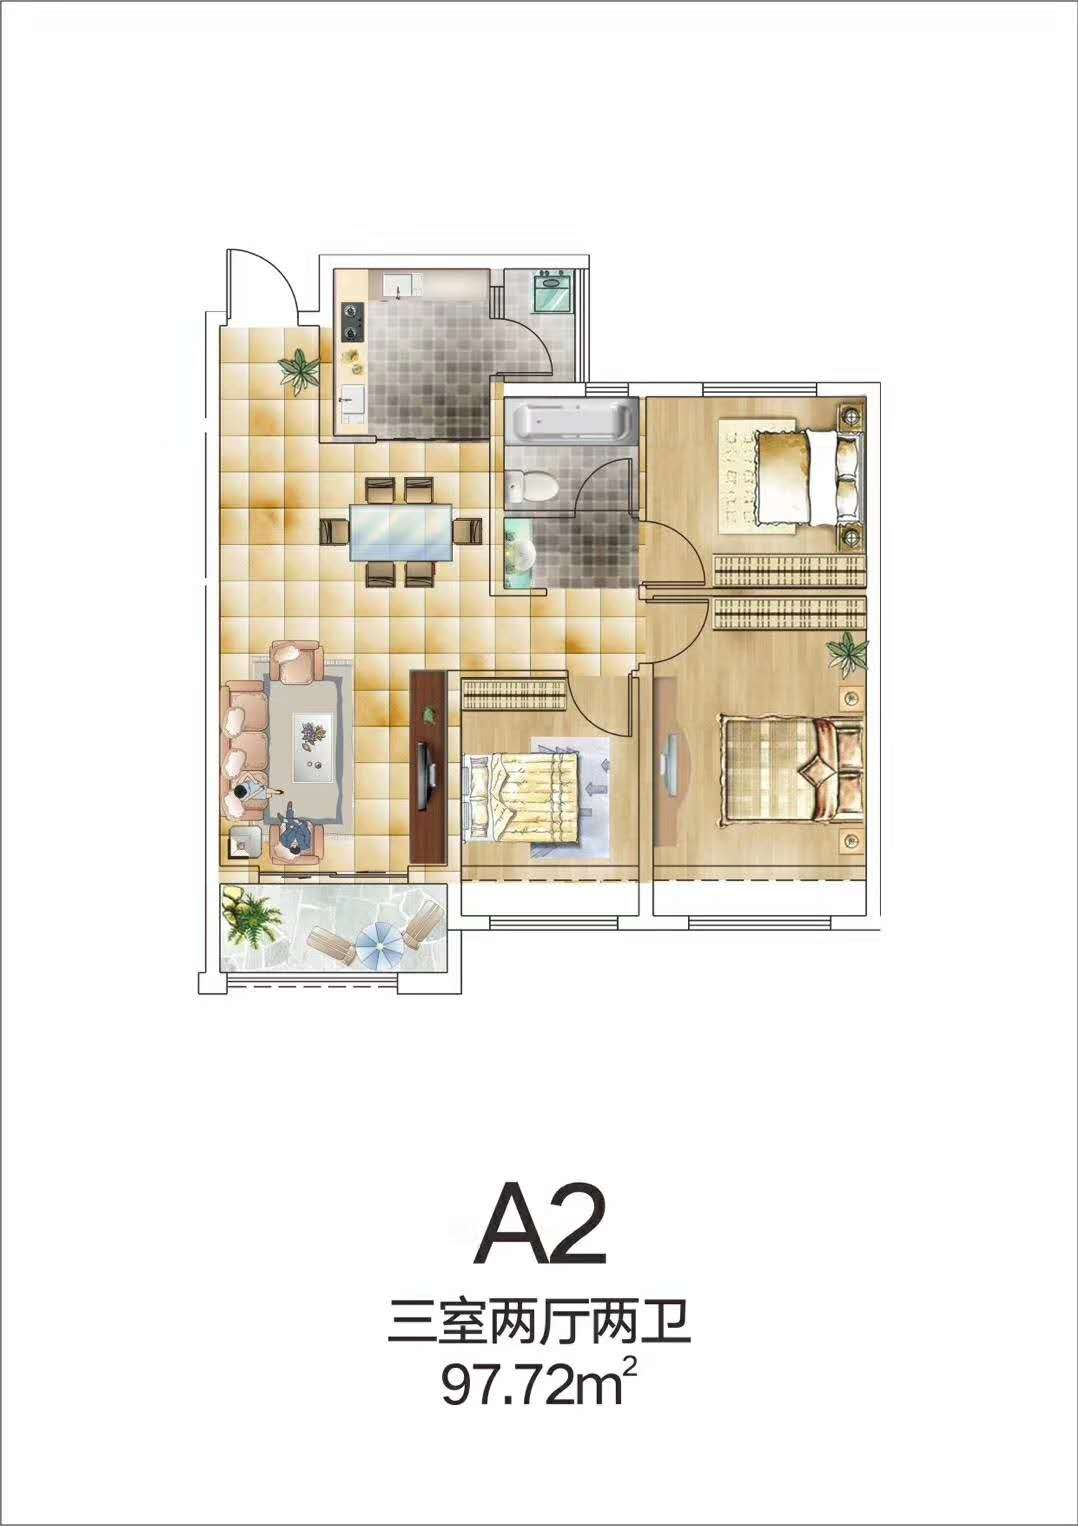 A2【蓝湾印象三】A2